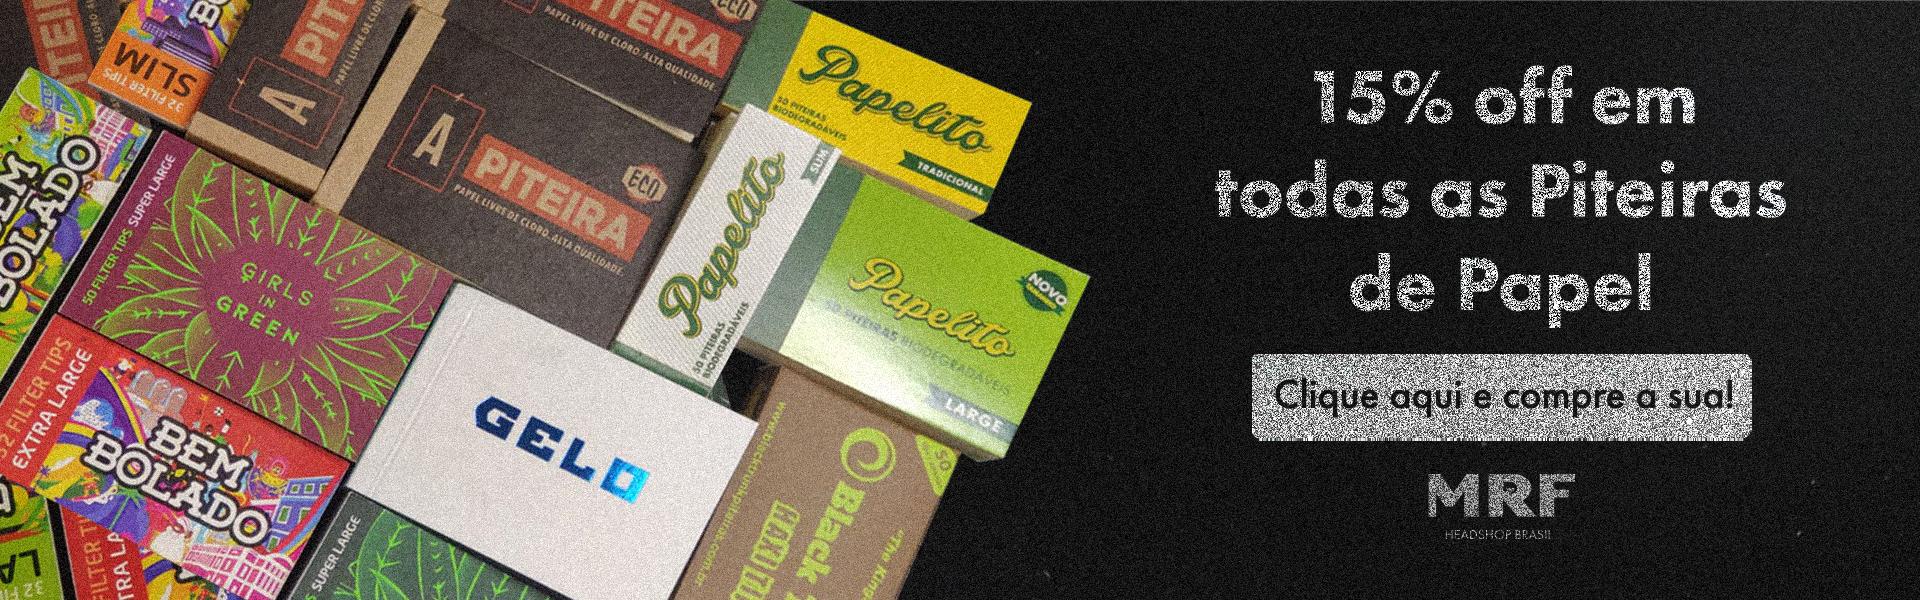 promo piteiras papel